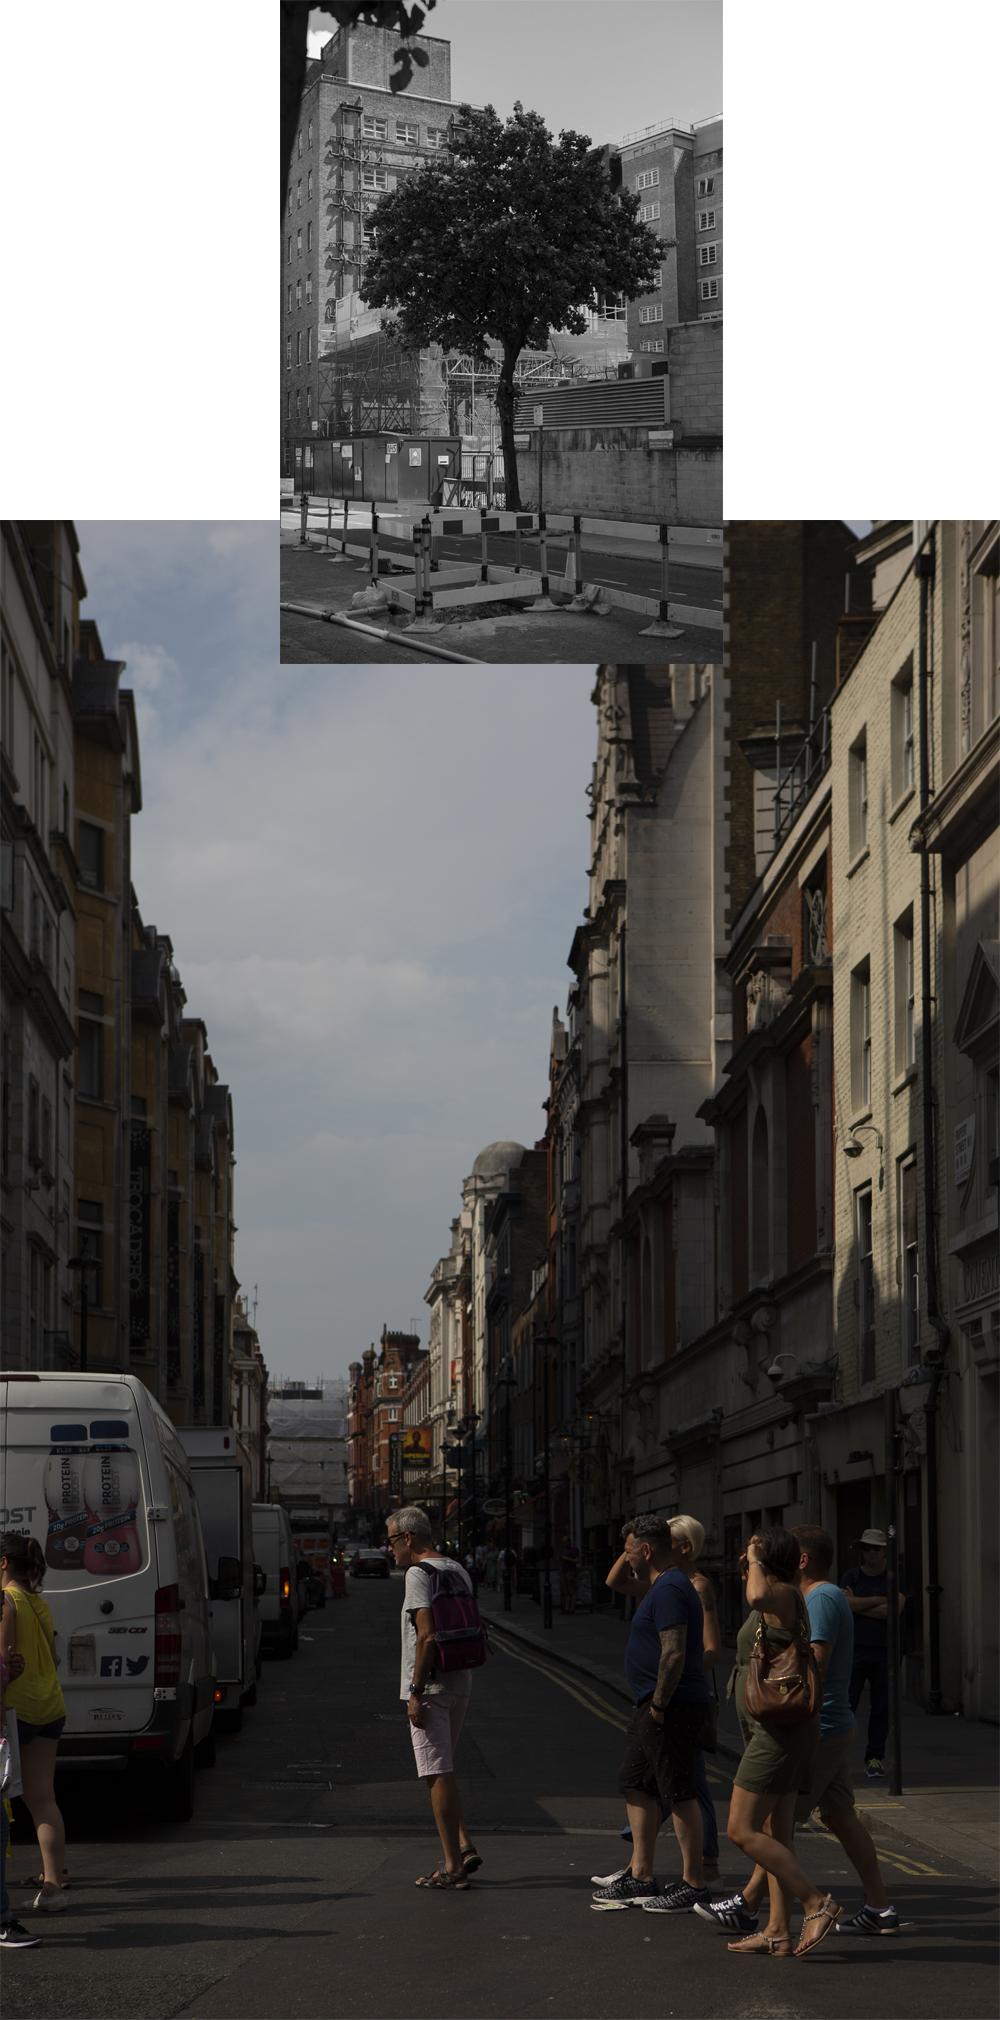 7_London_by_Amelie_Niederbuchner, London, Visual Diary, shot by Amelie Niederbuchner, photographer from Munich, blog The Curly Head